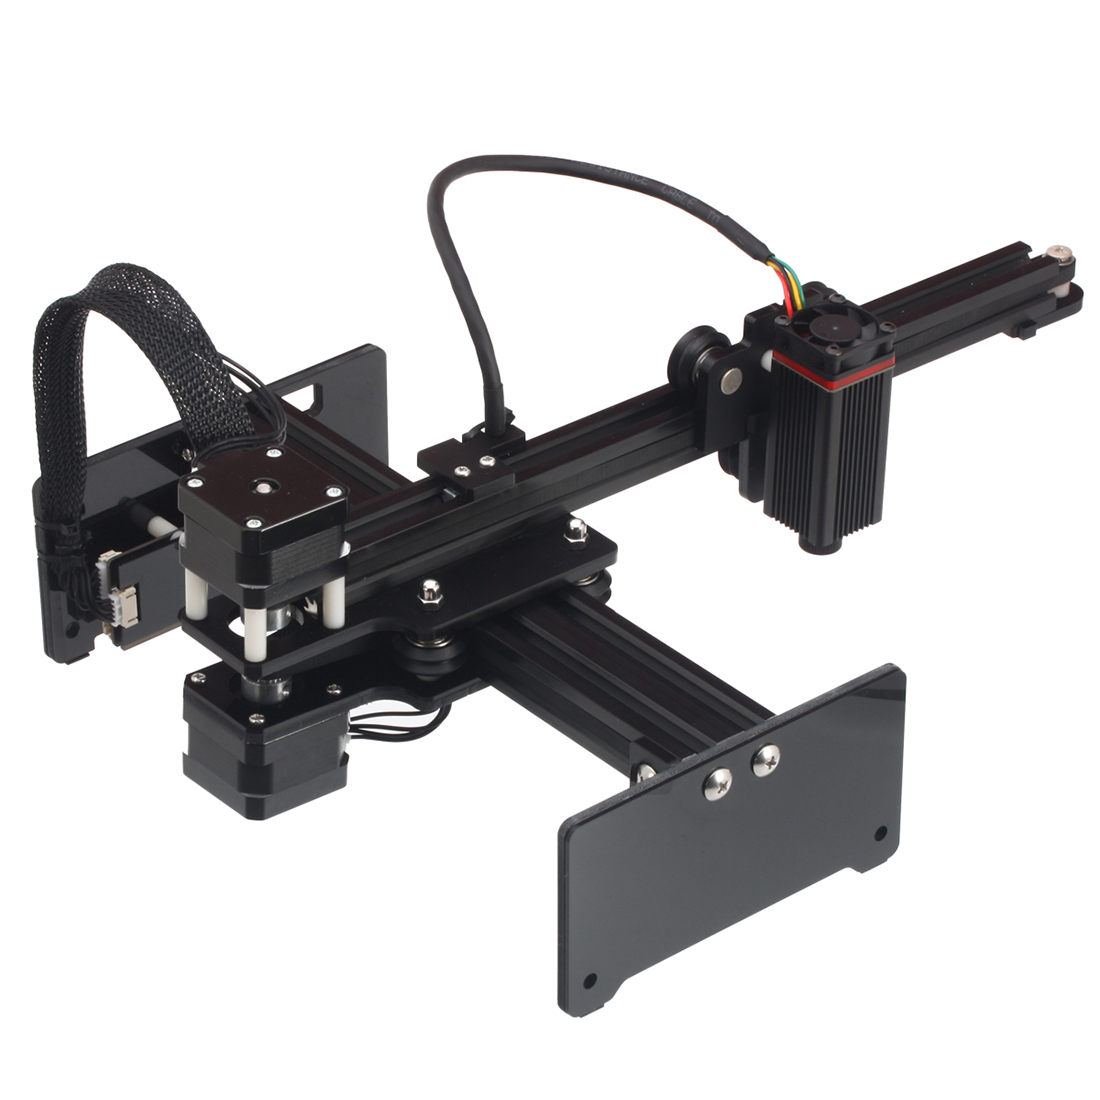 NEJE Master 20MW Laser Engraving Machine DIY Mini Desktop Engraver Play Game Education Christmas Birthday Gift For Children Kids